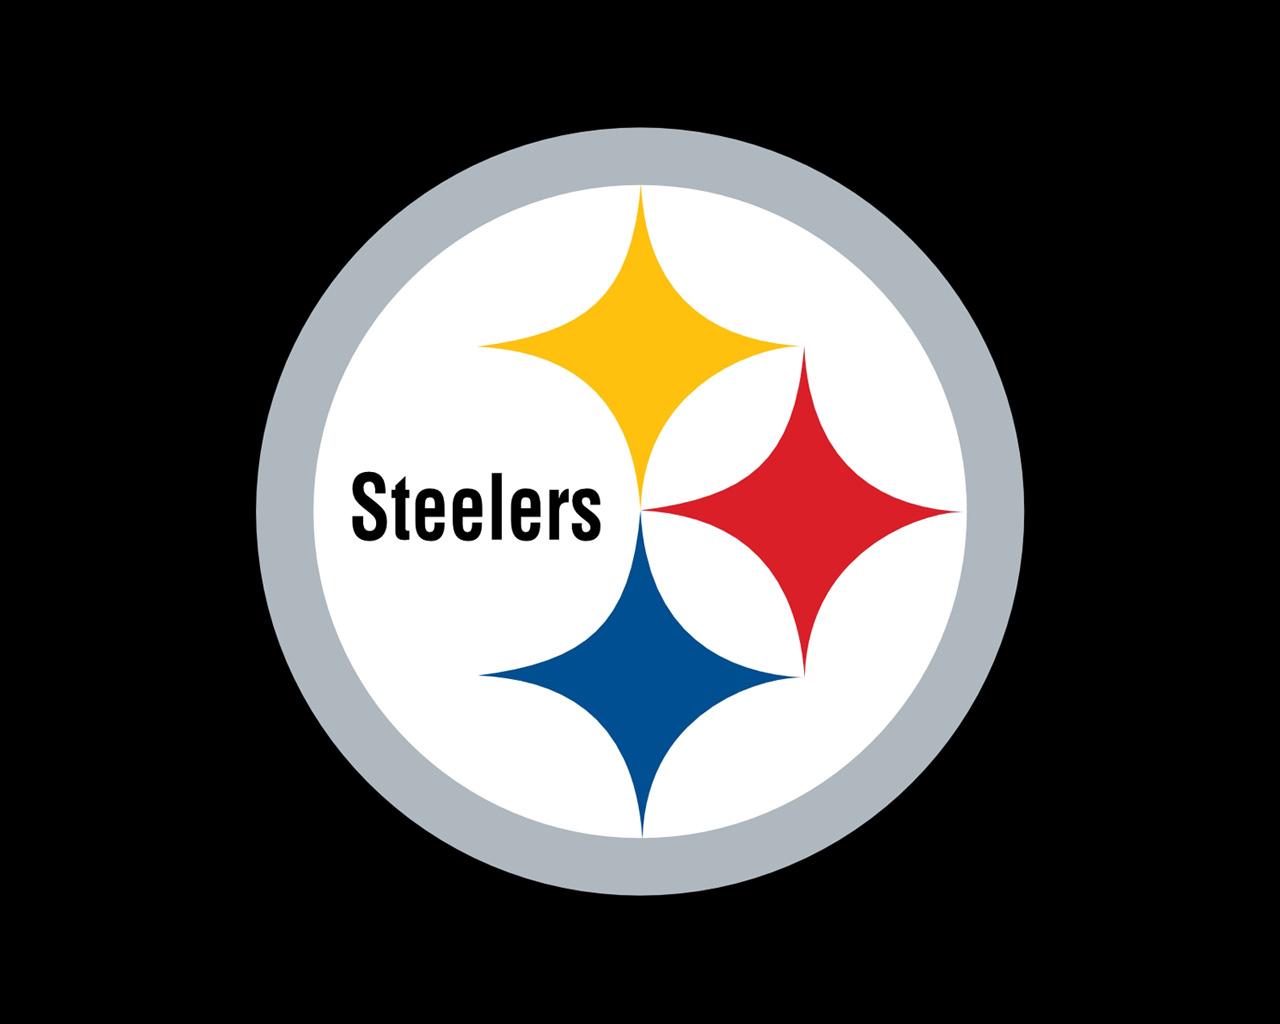 Download All 32 NFL Team Logos Wallpaper 1280 x 1024 torrent 1280x1024